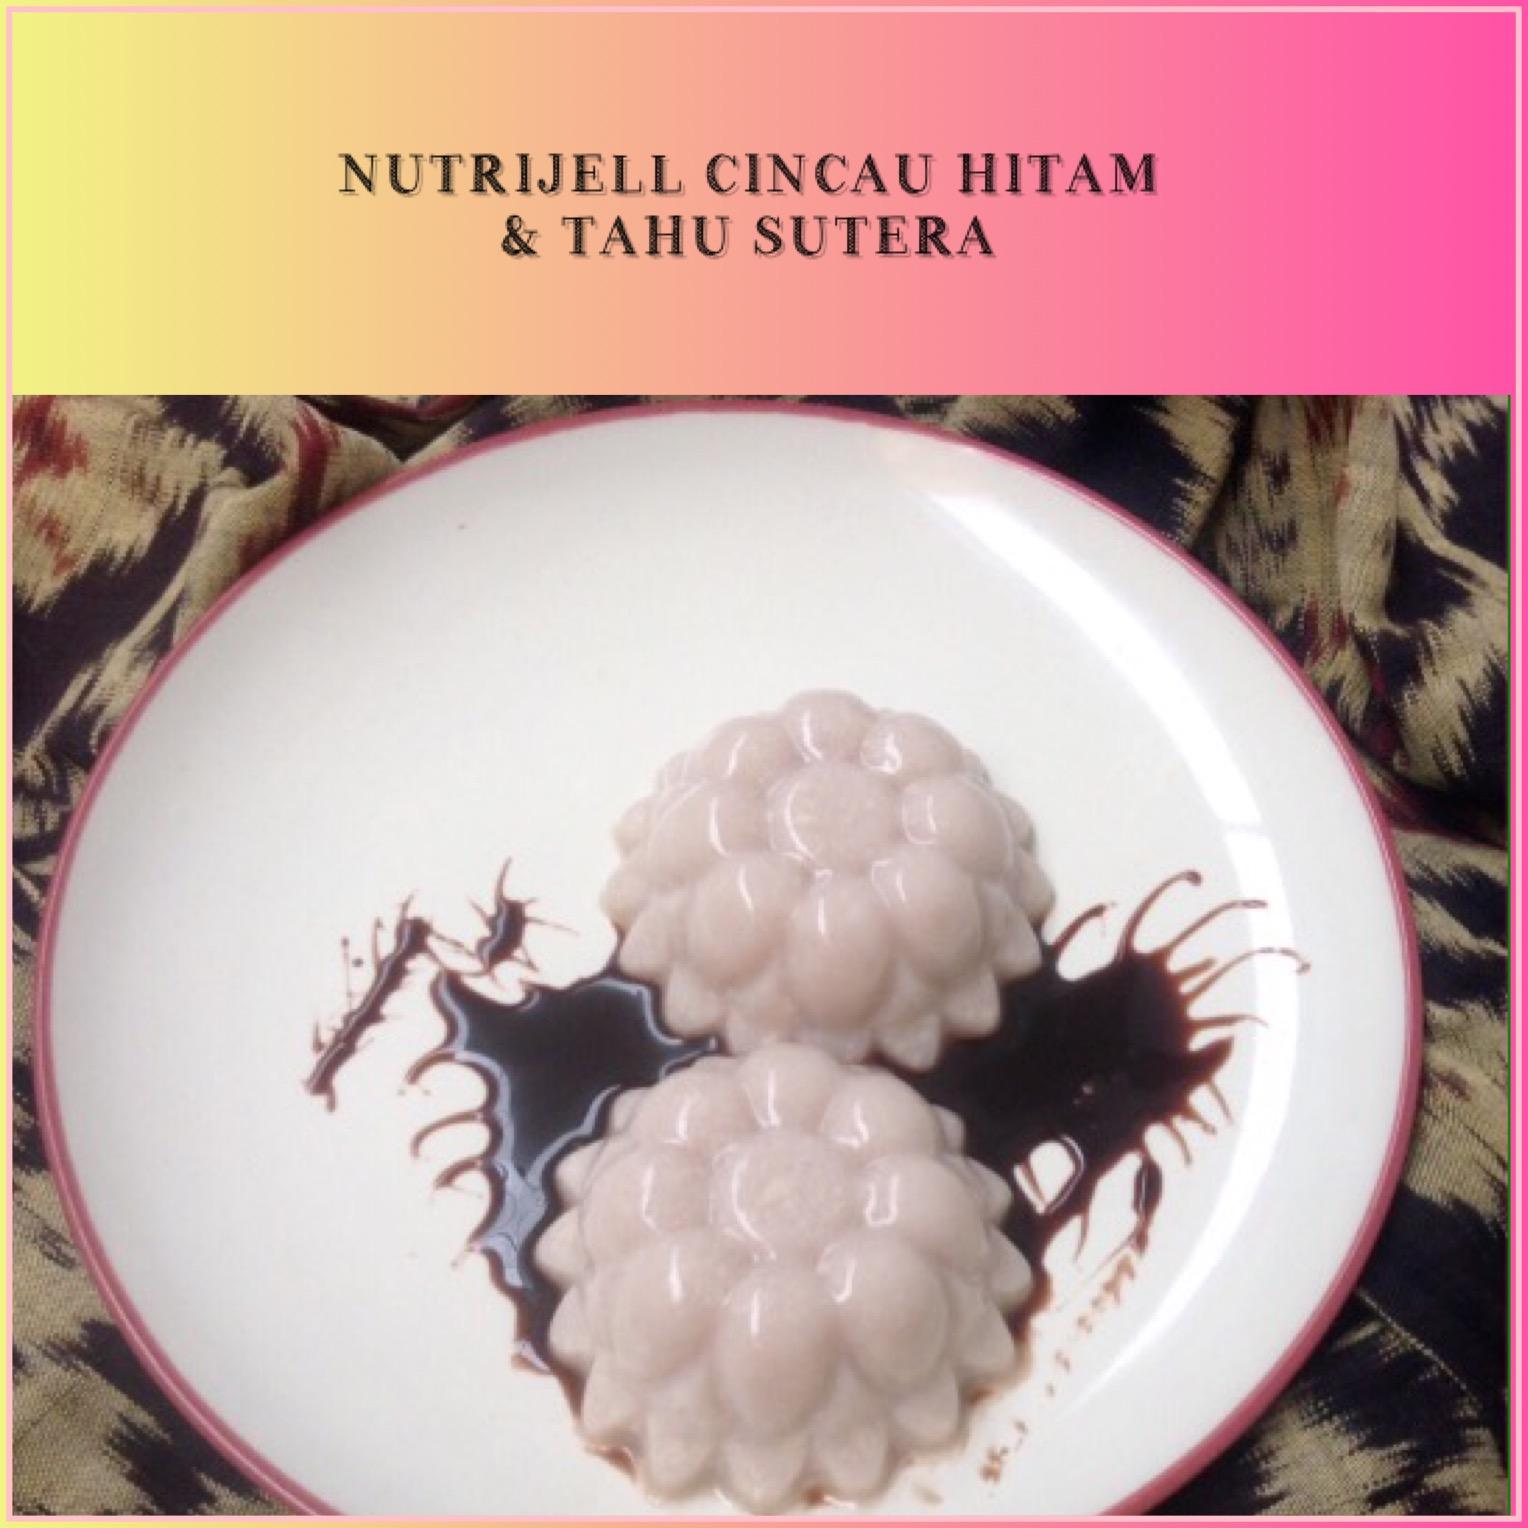 Resep Nutrijell Cincau Hitam & Tahu Sutra